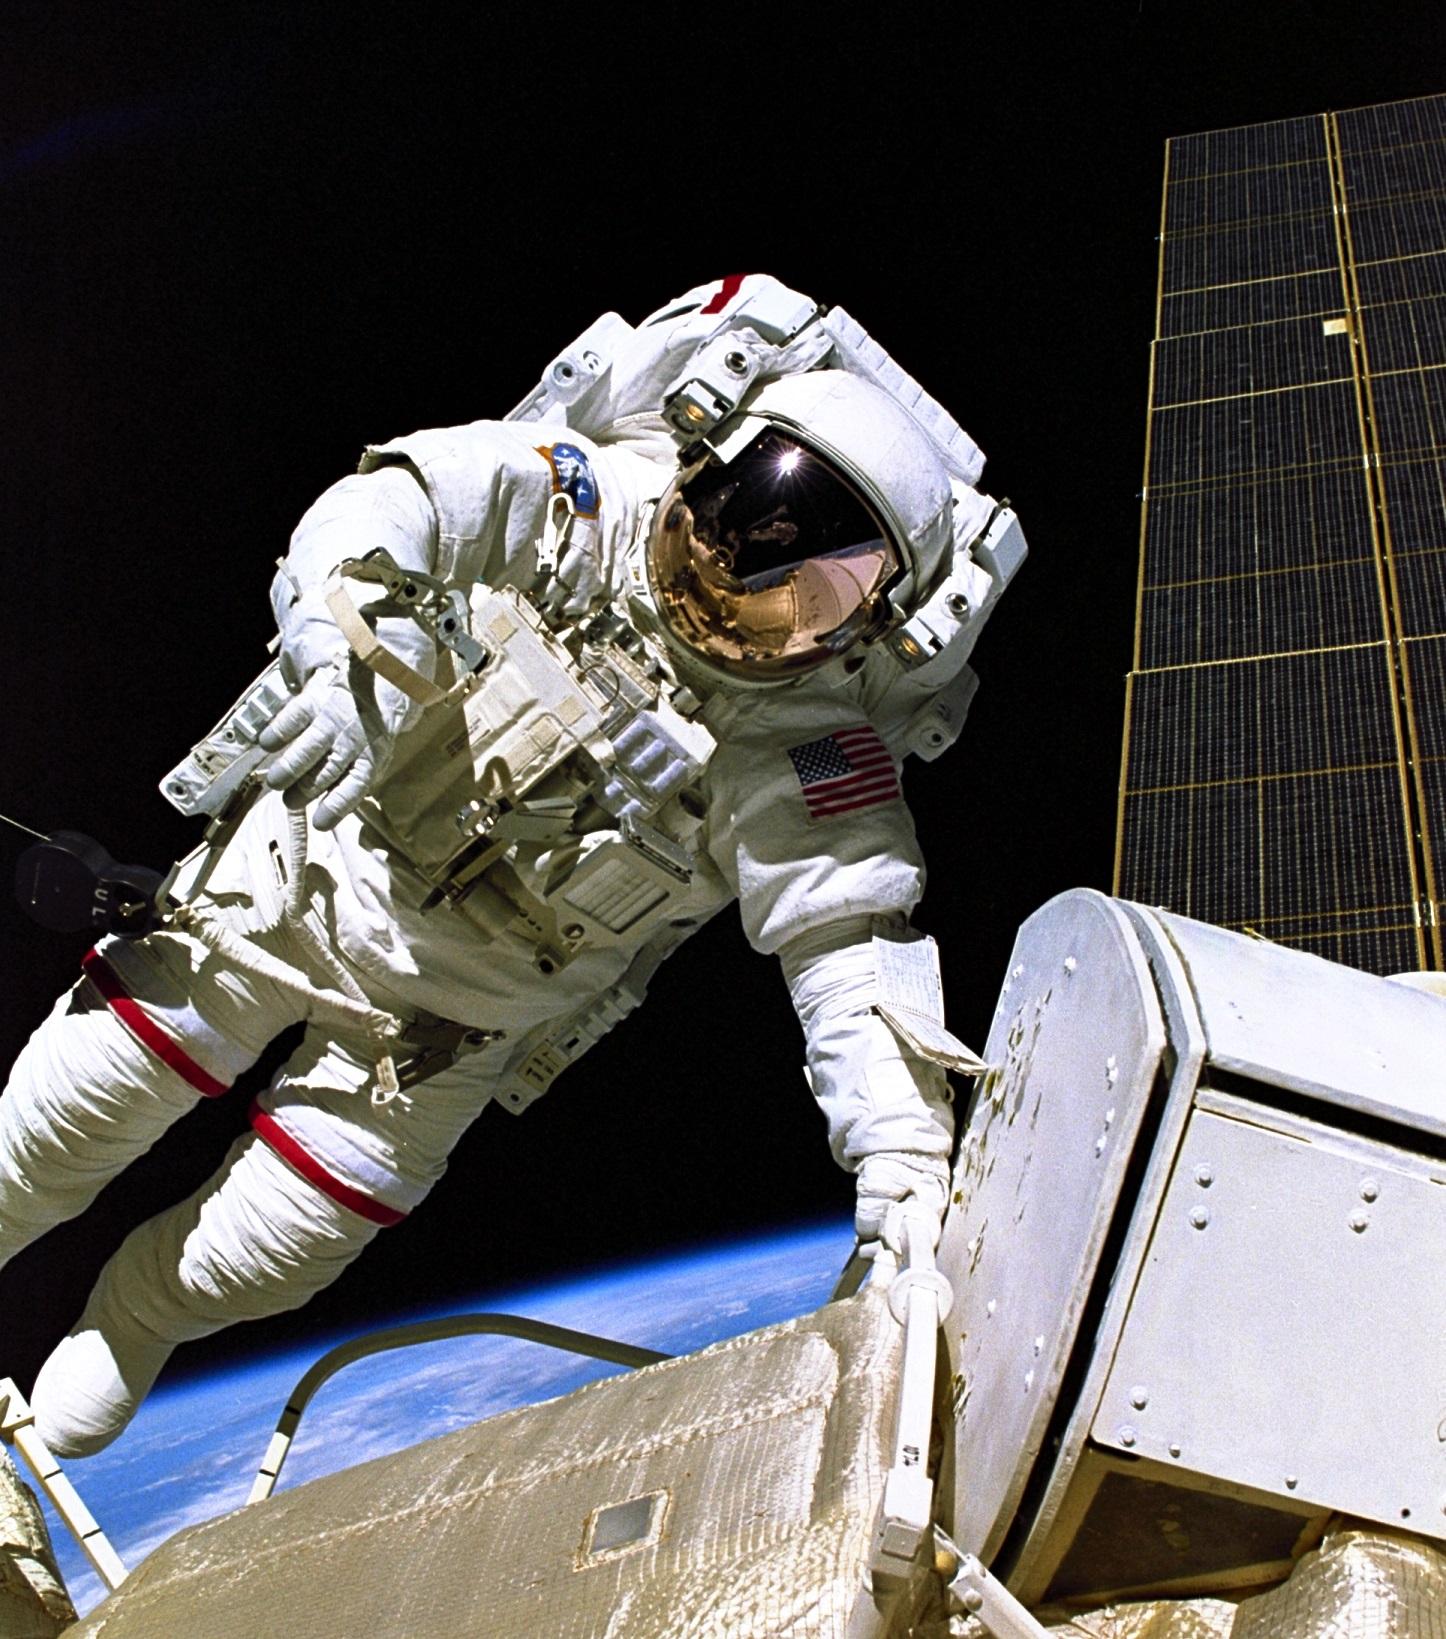 international space station astronauts list - photo #38